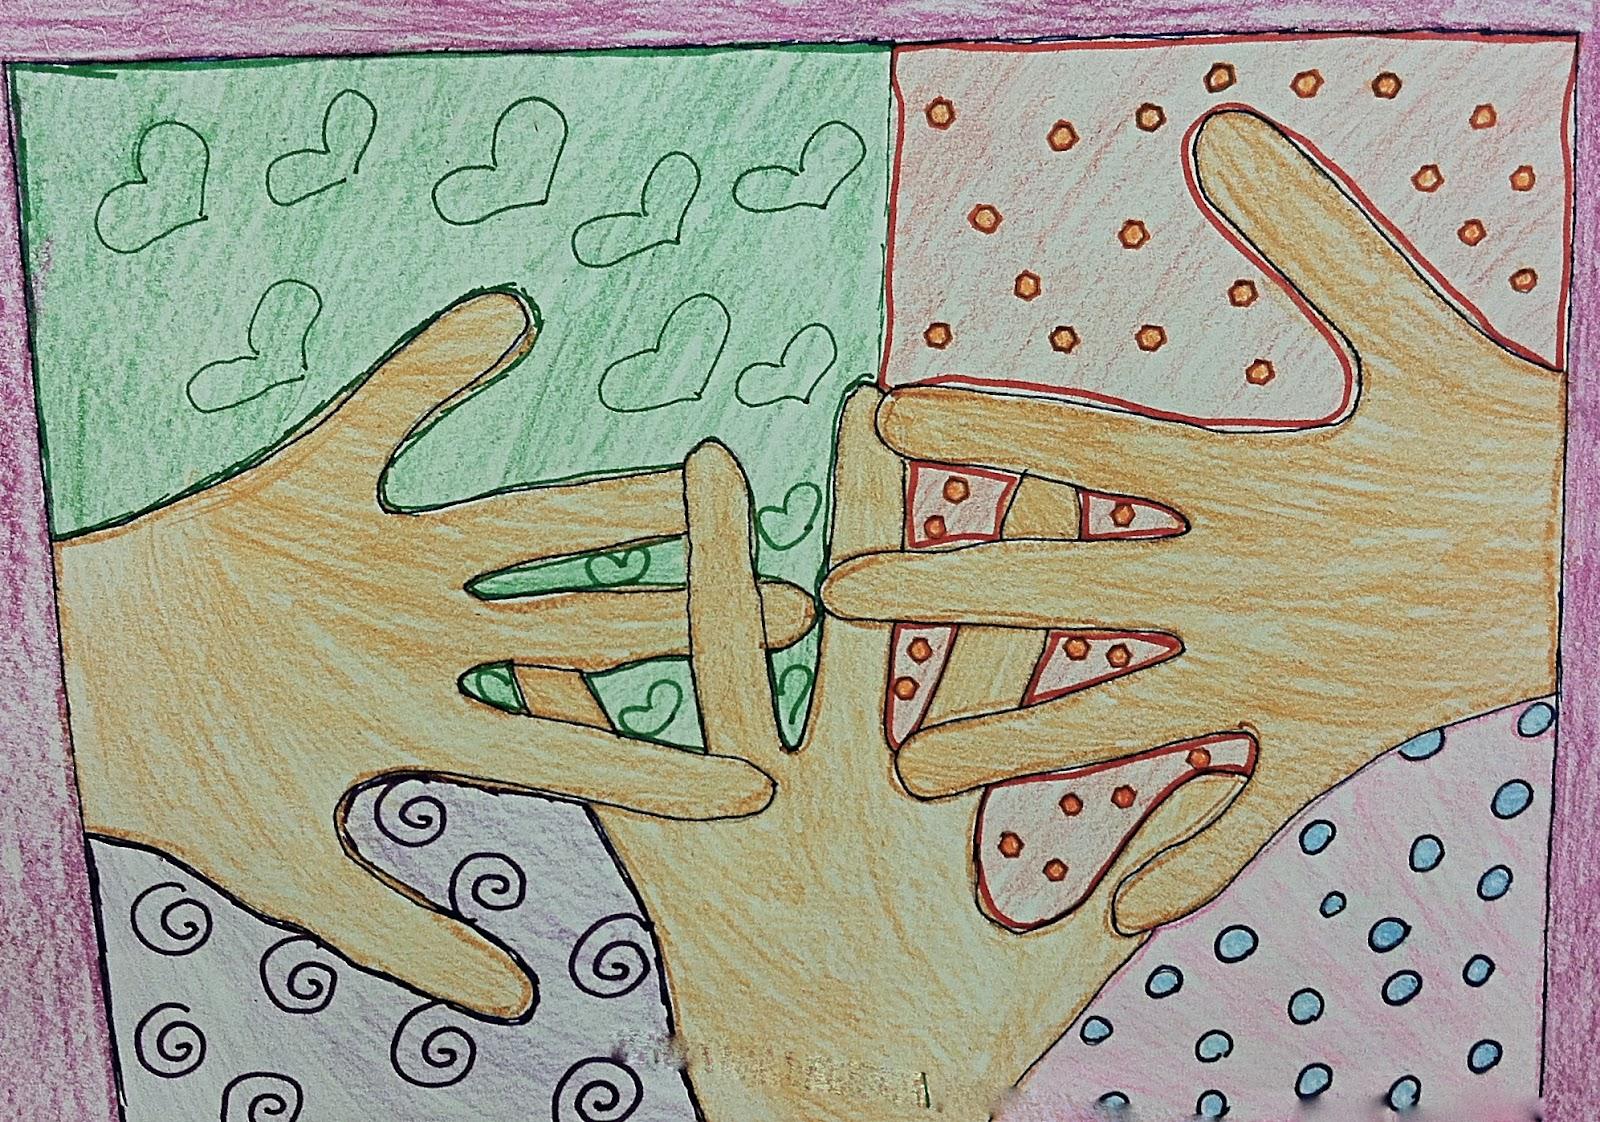 Avah Ham 3rd Amp 5th Grade Art Projects